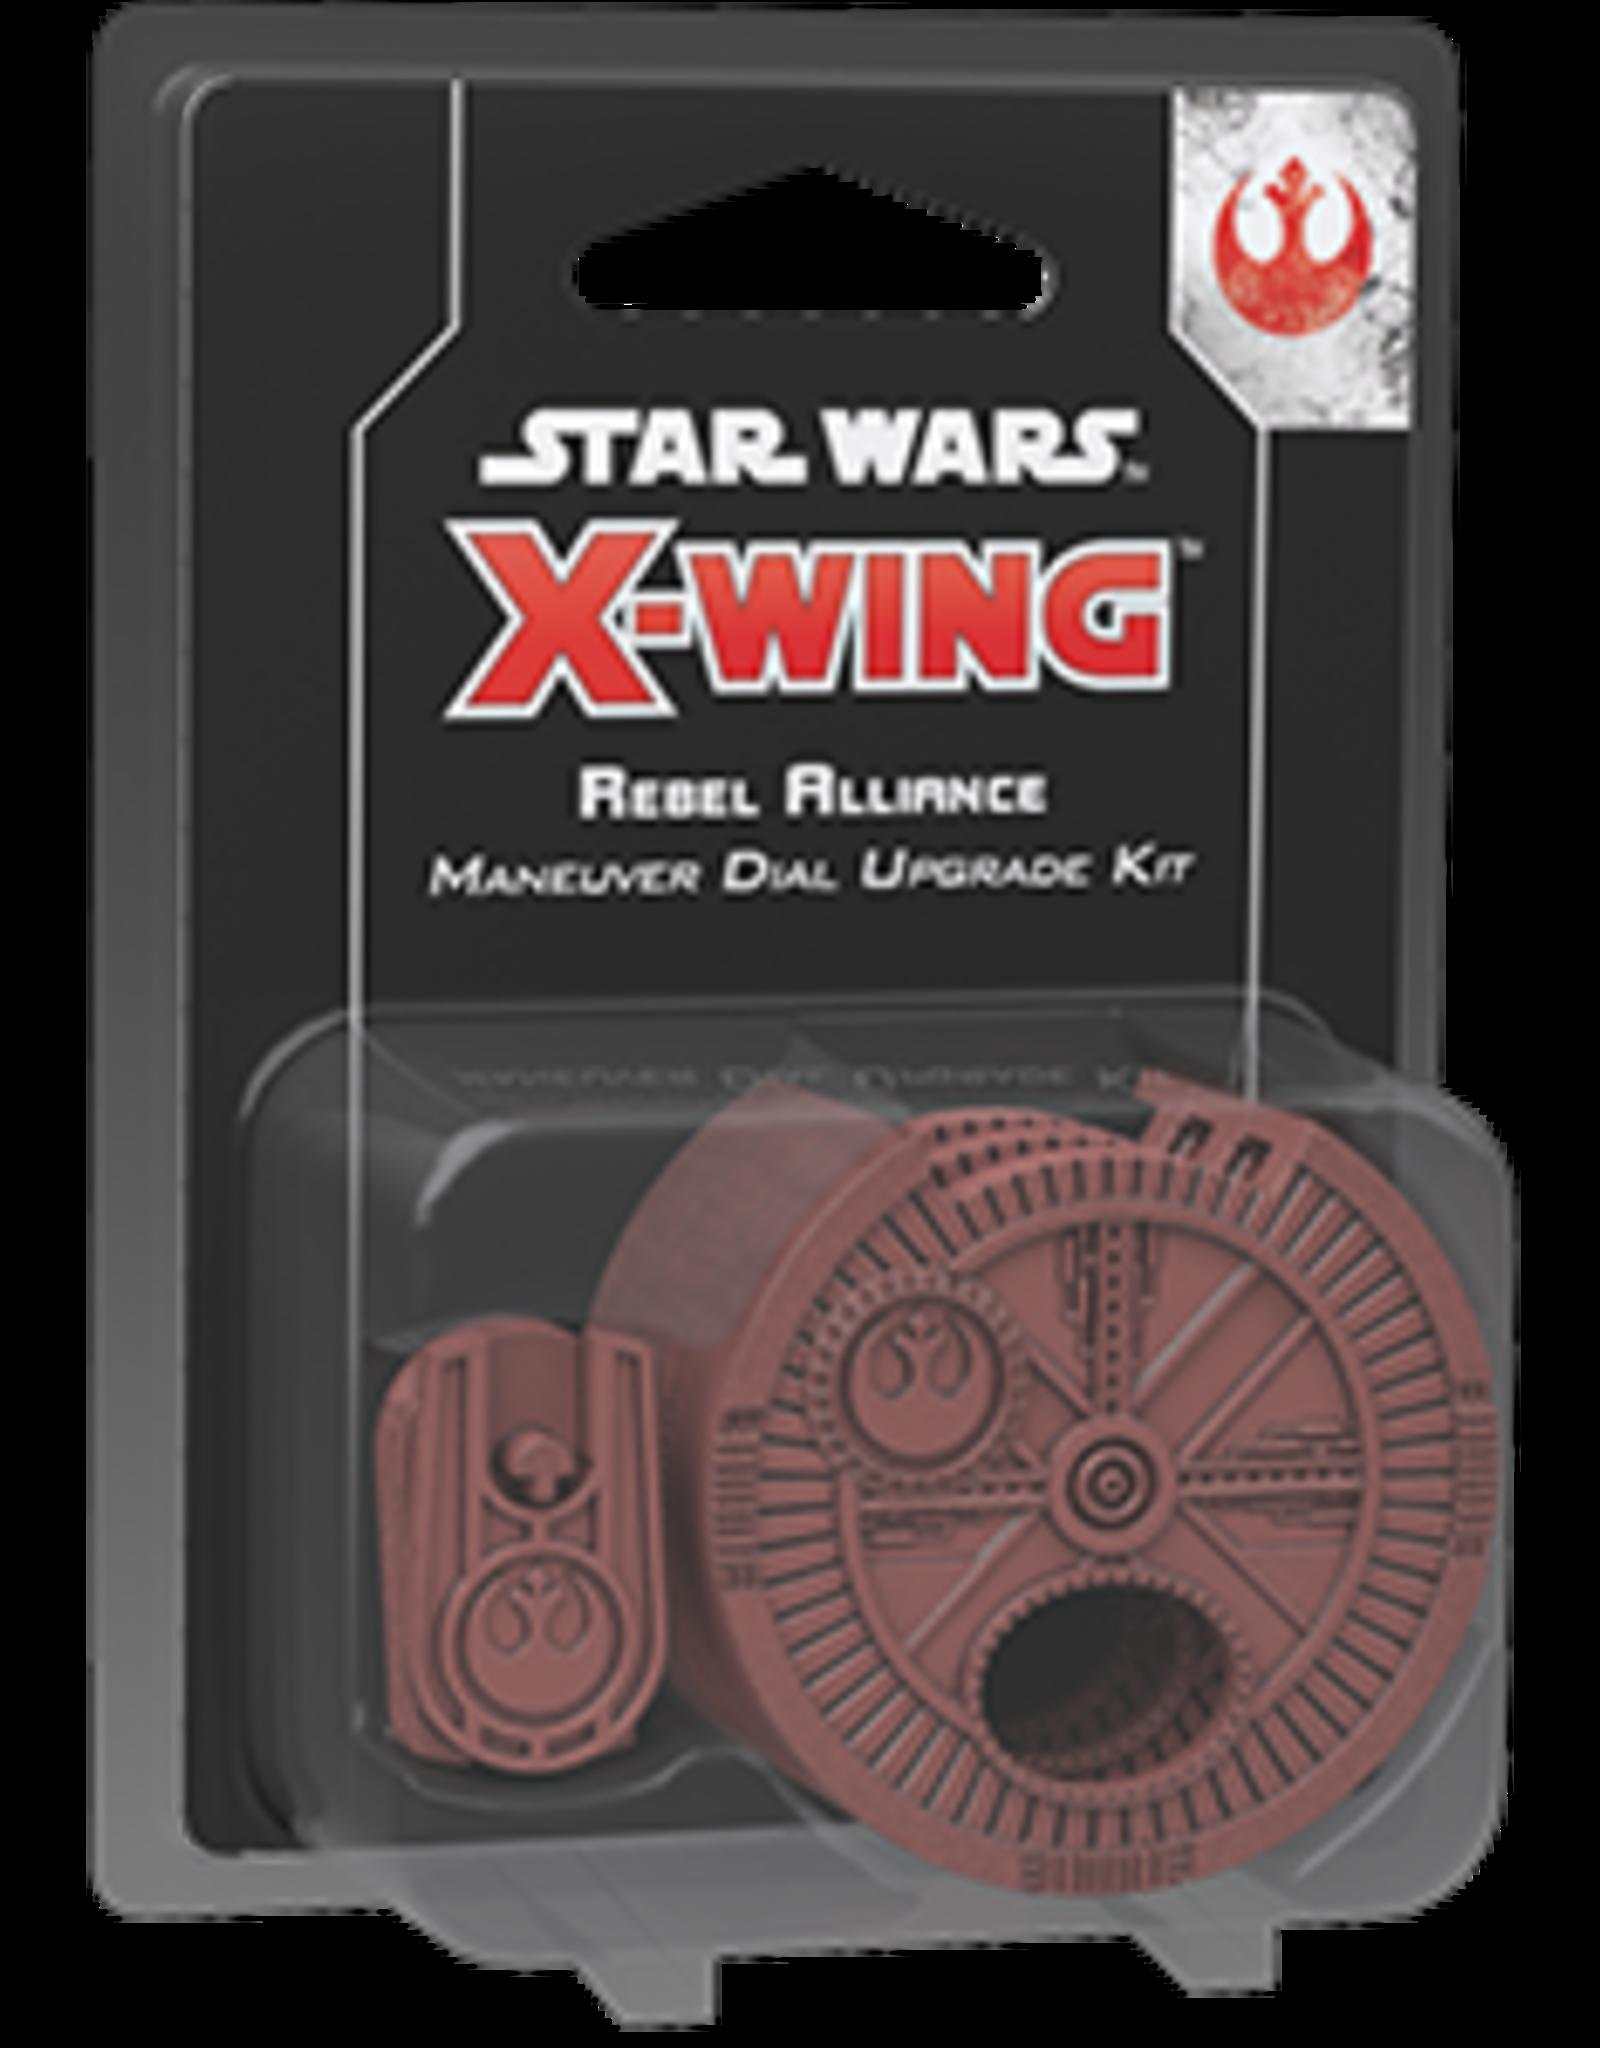 Fantasy Flight Star Wars X-Wing 2.0 Miniatures Game: Rebel Alliance Maneuver Dial Upgrade Kit